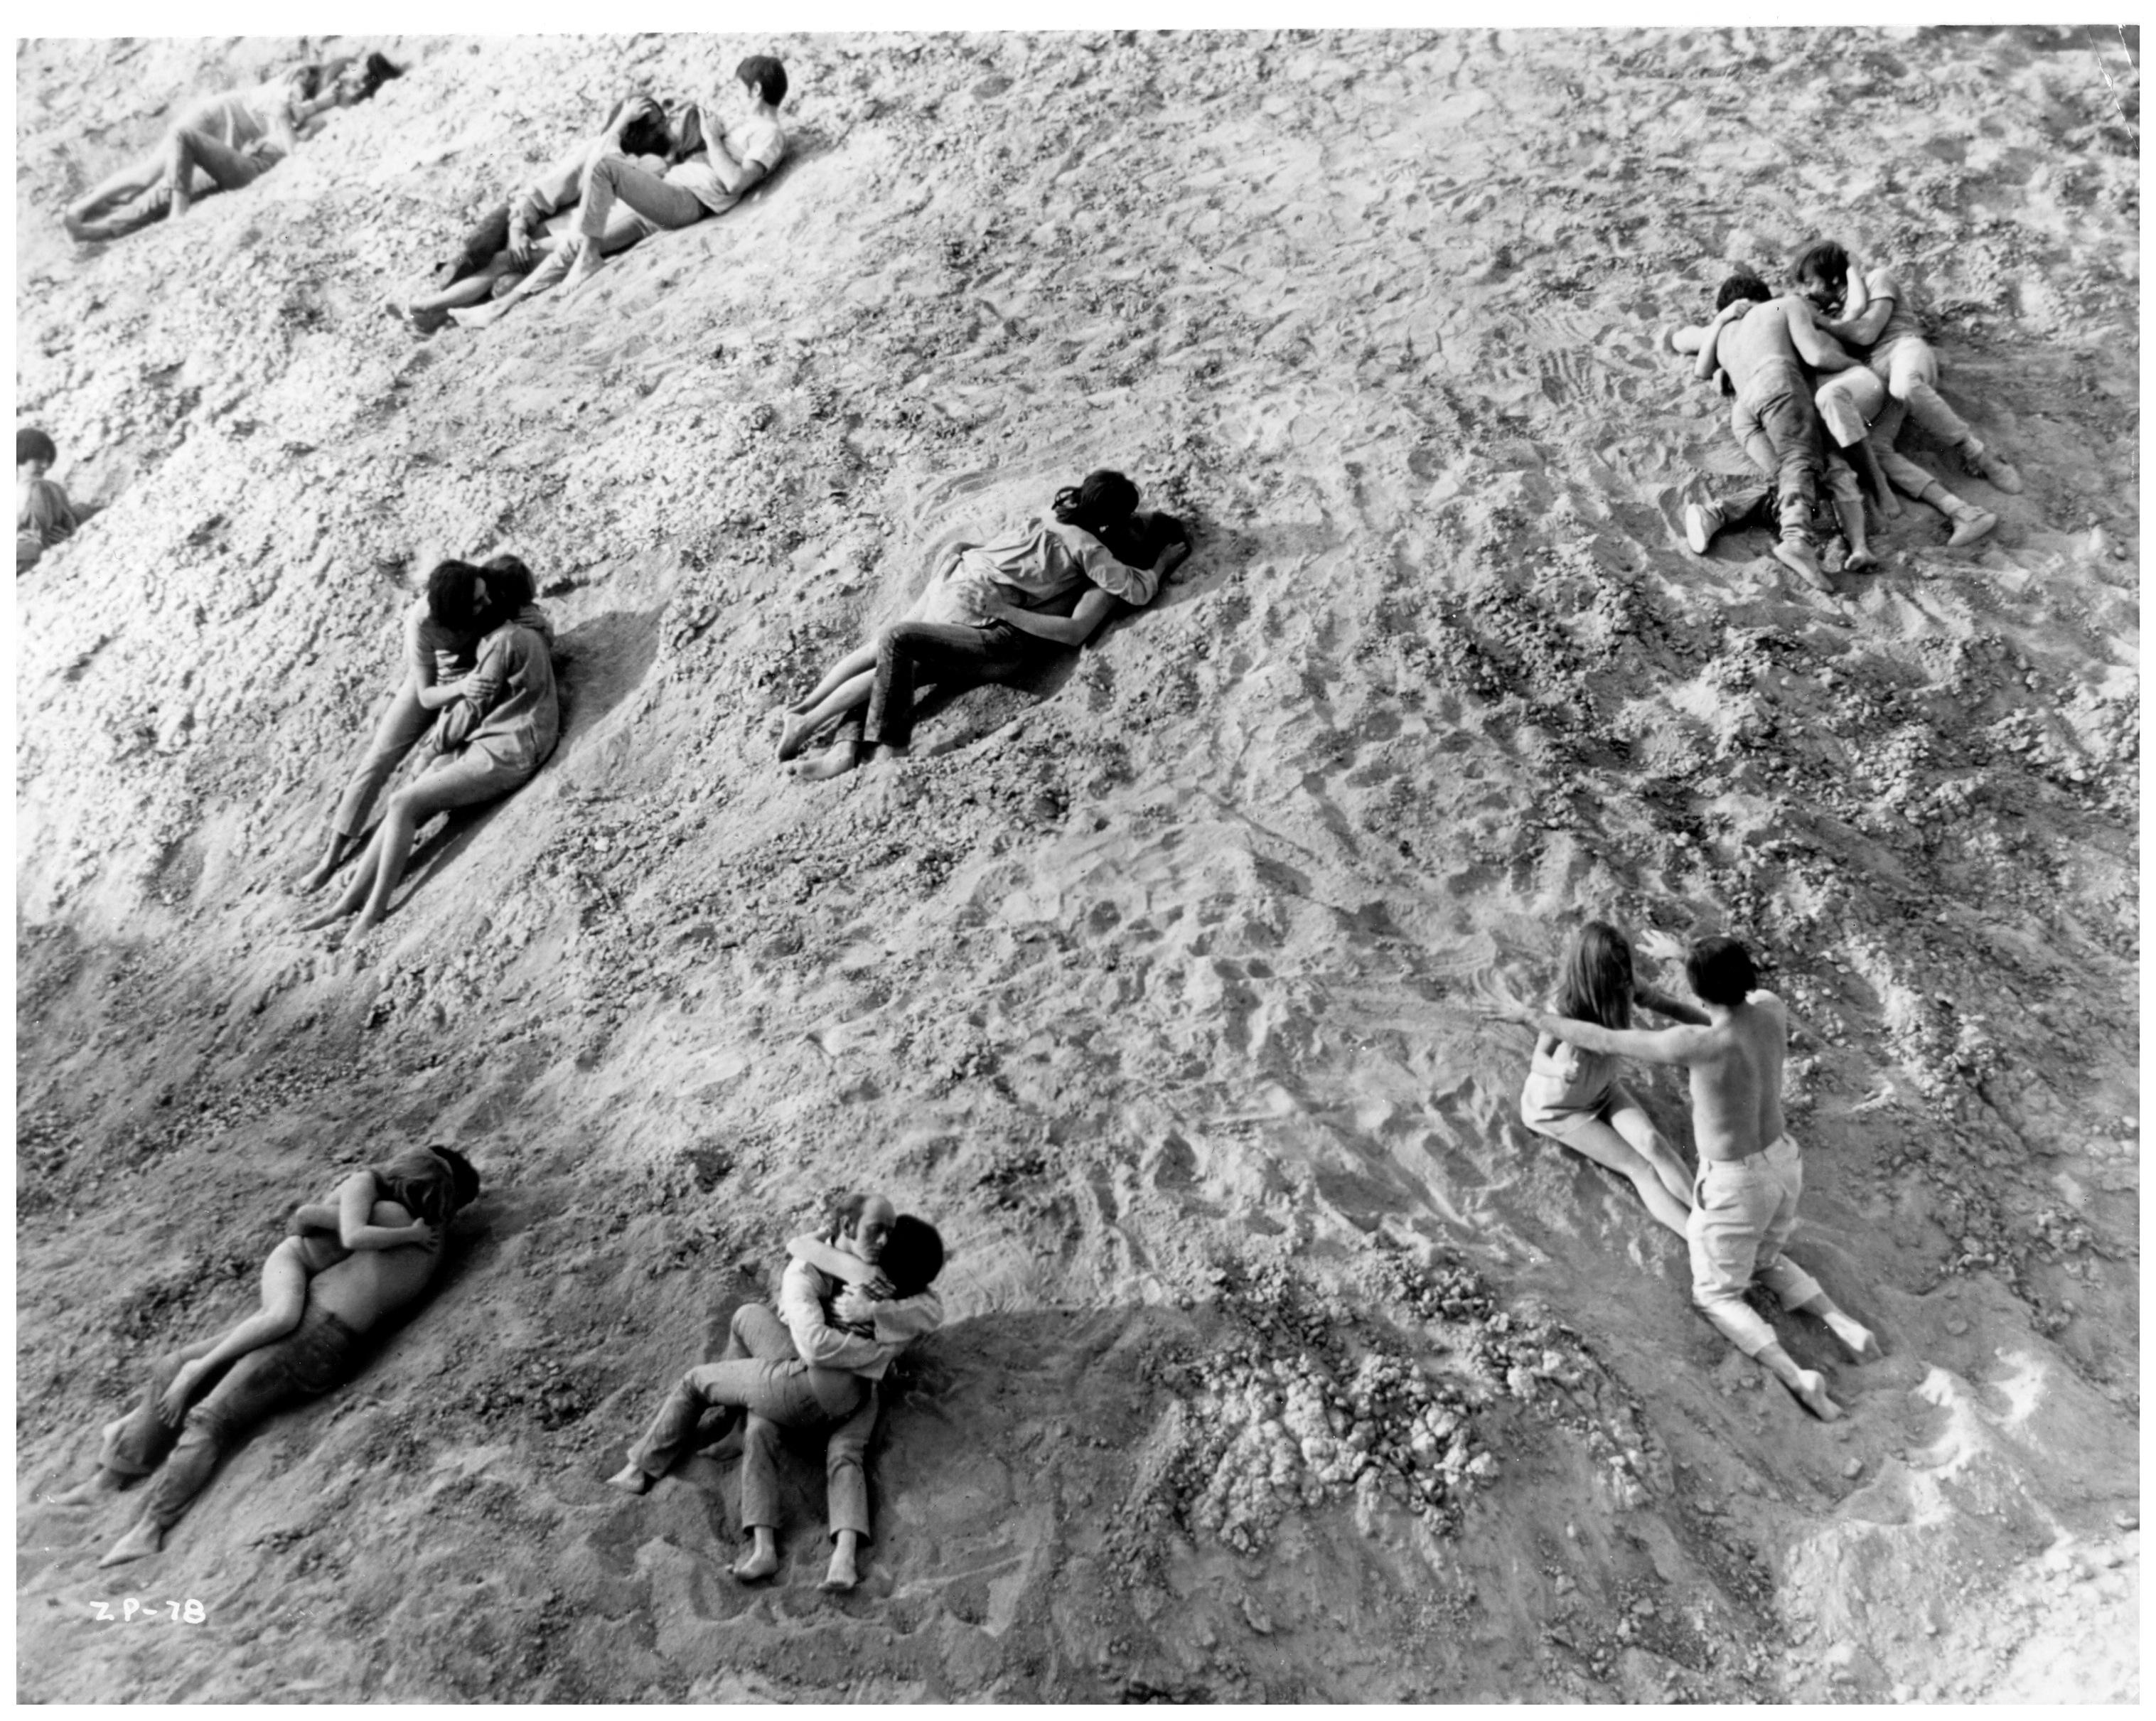 Zabriskie Point (1970)